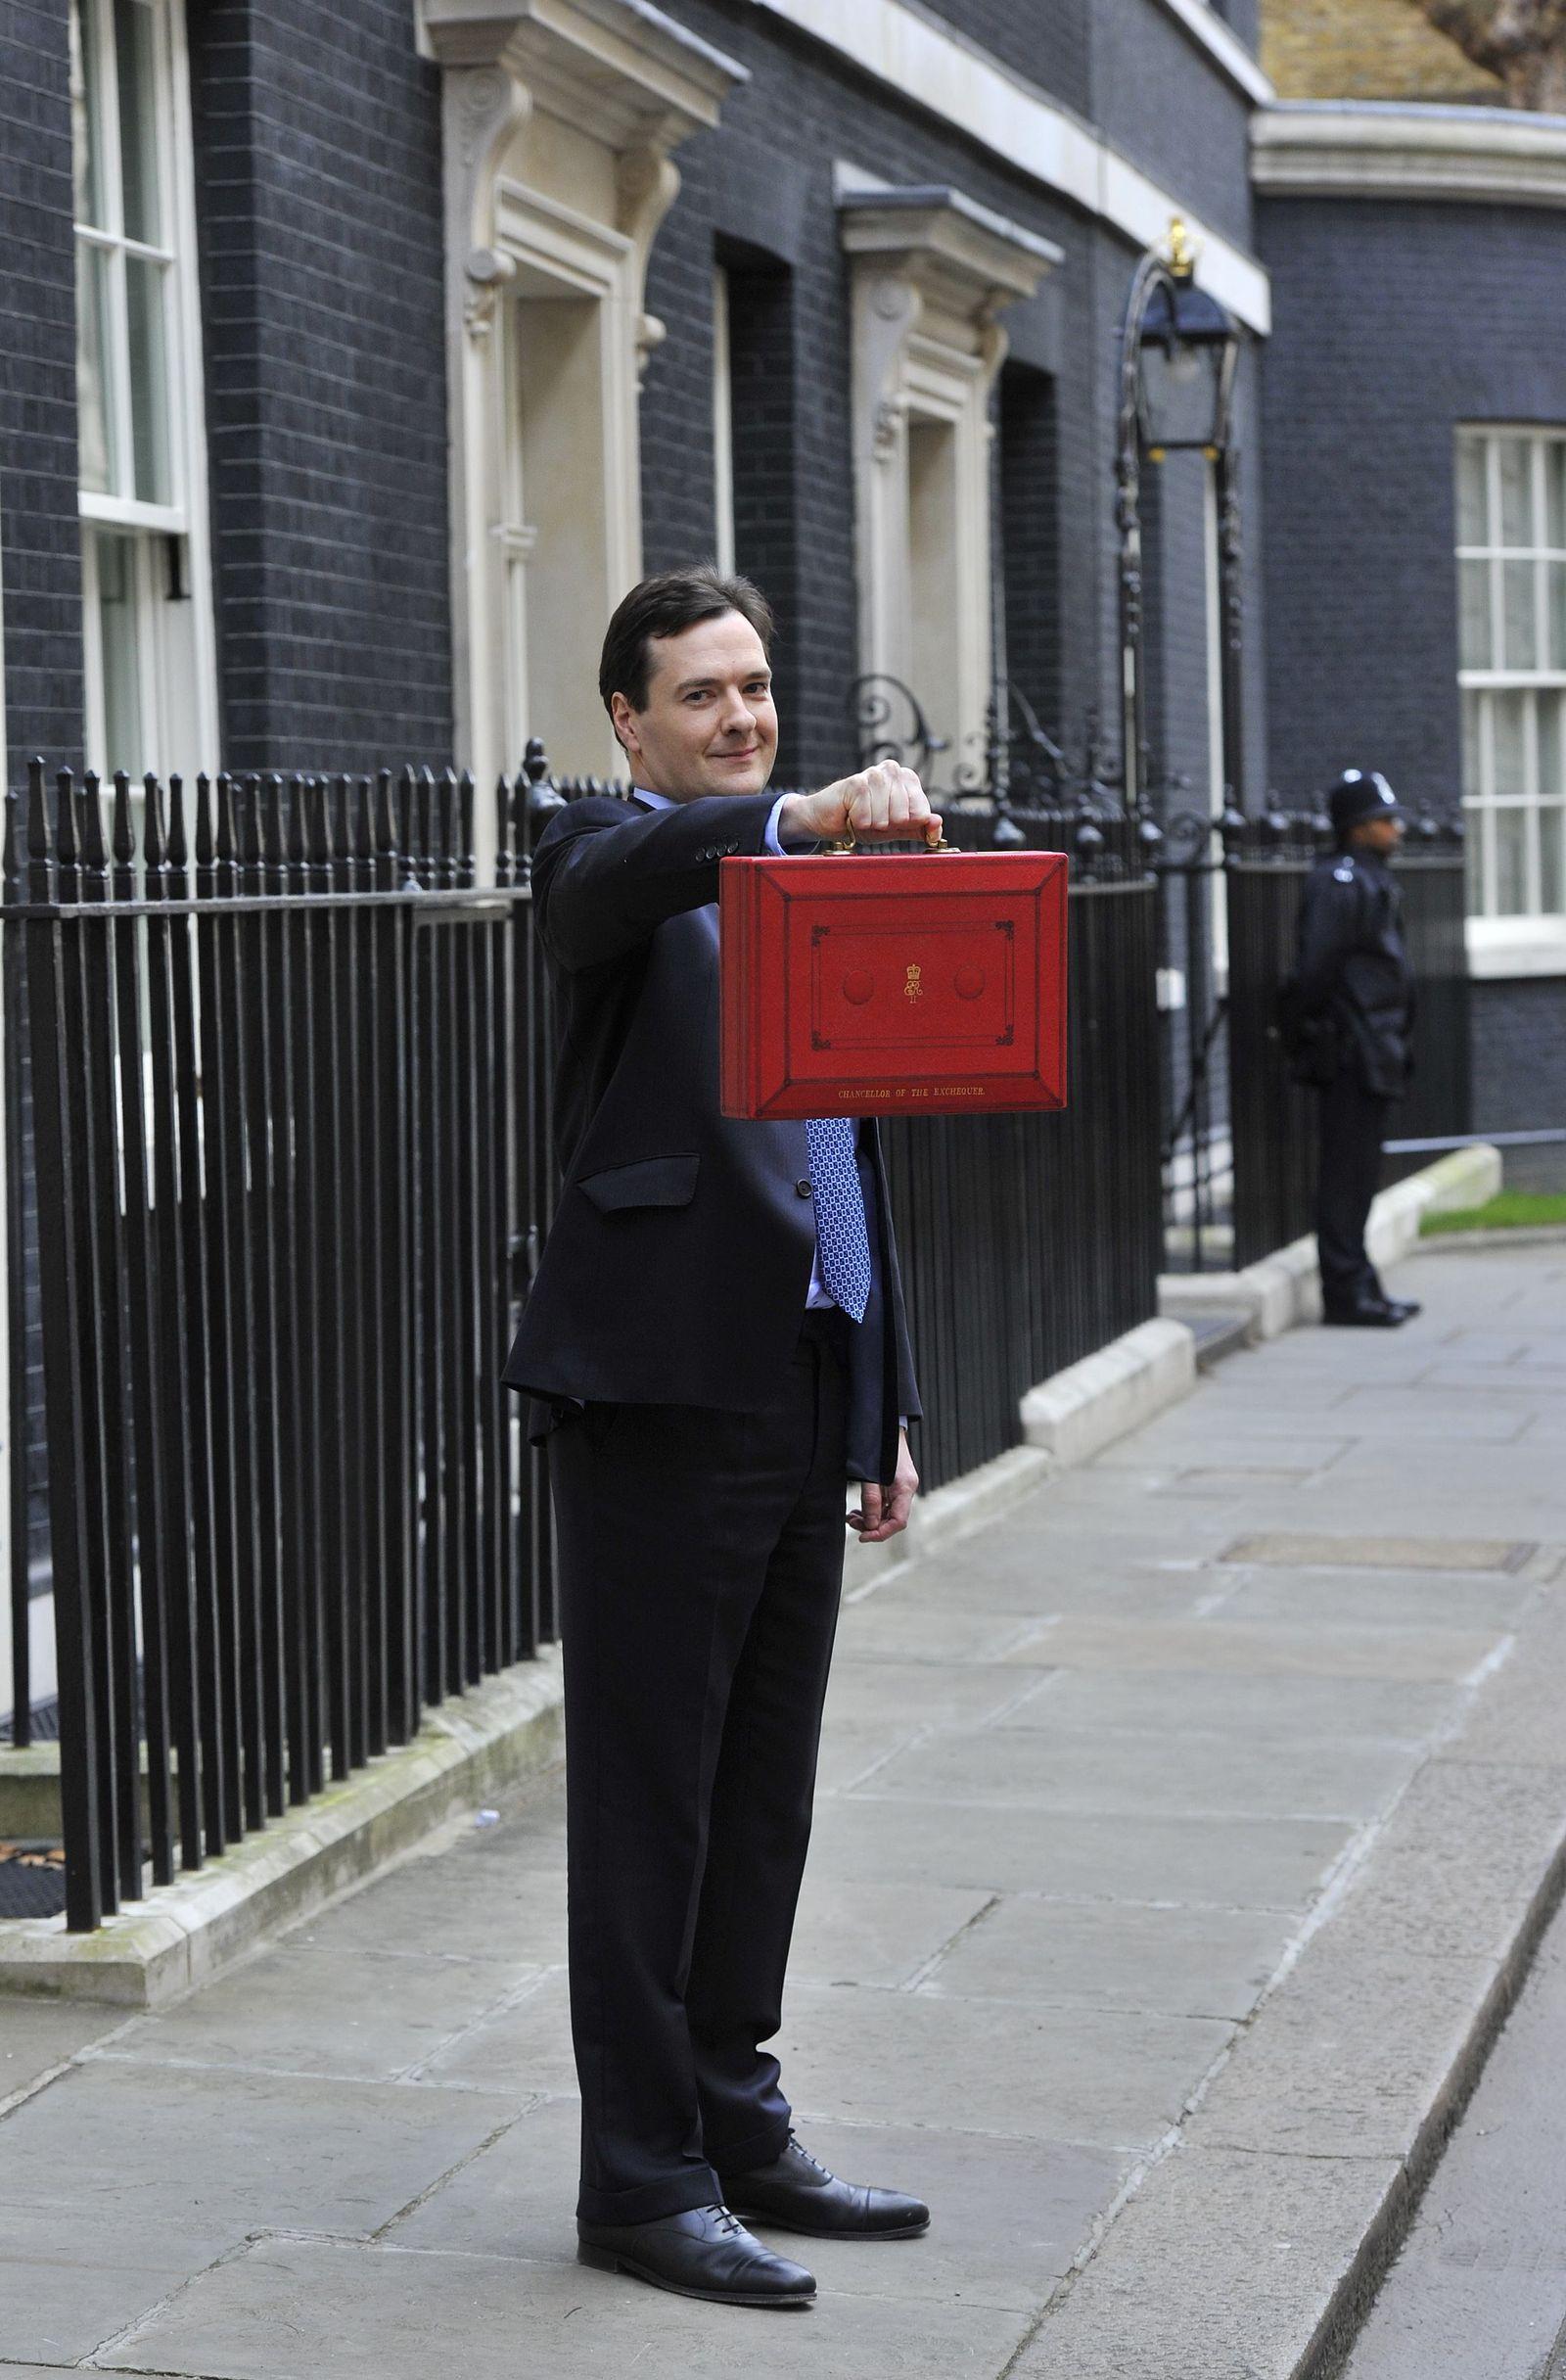 George Osborne / Rotes Köfferchen